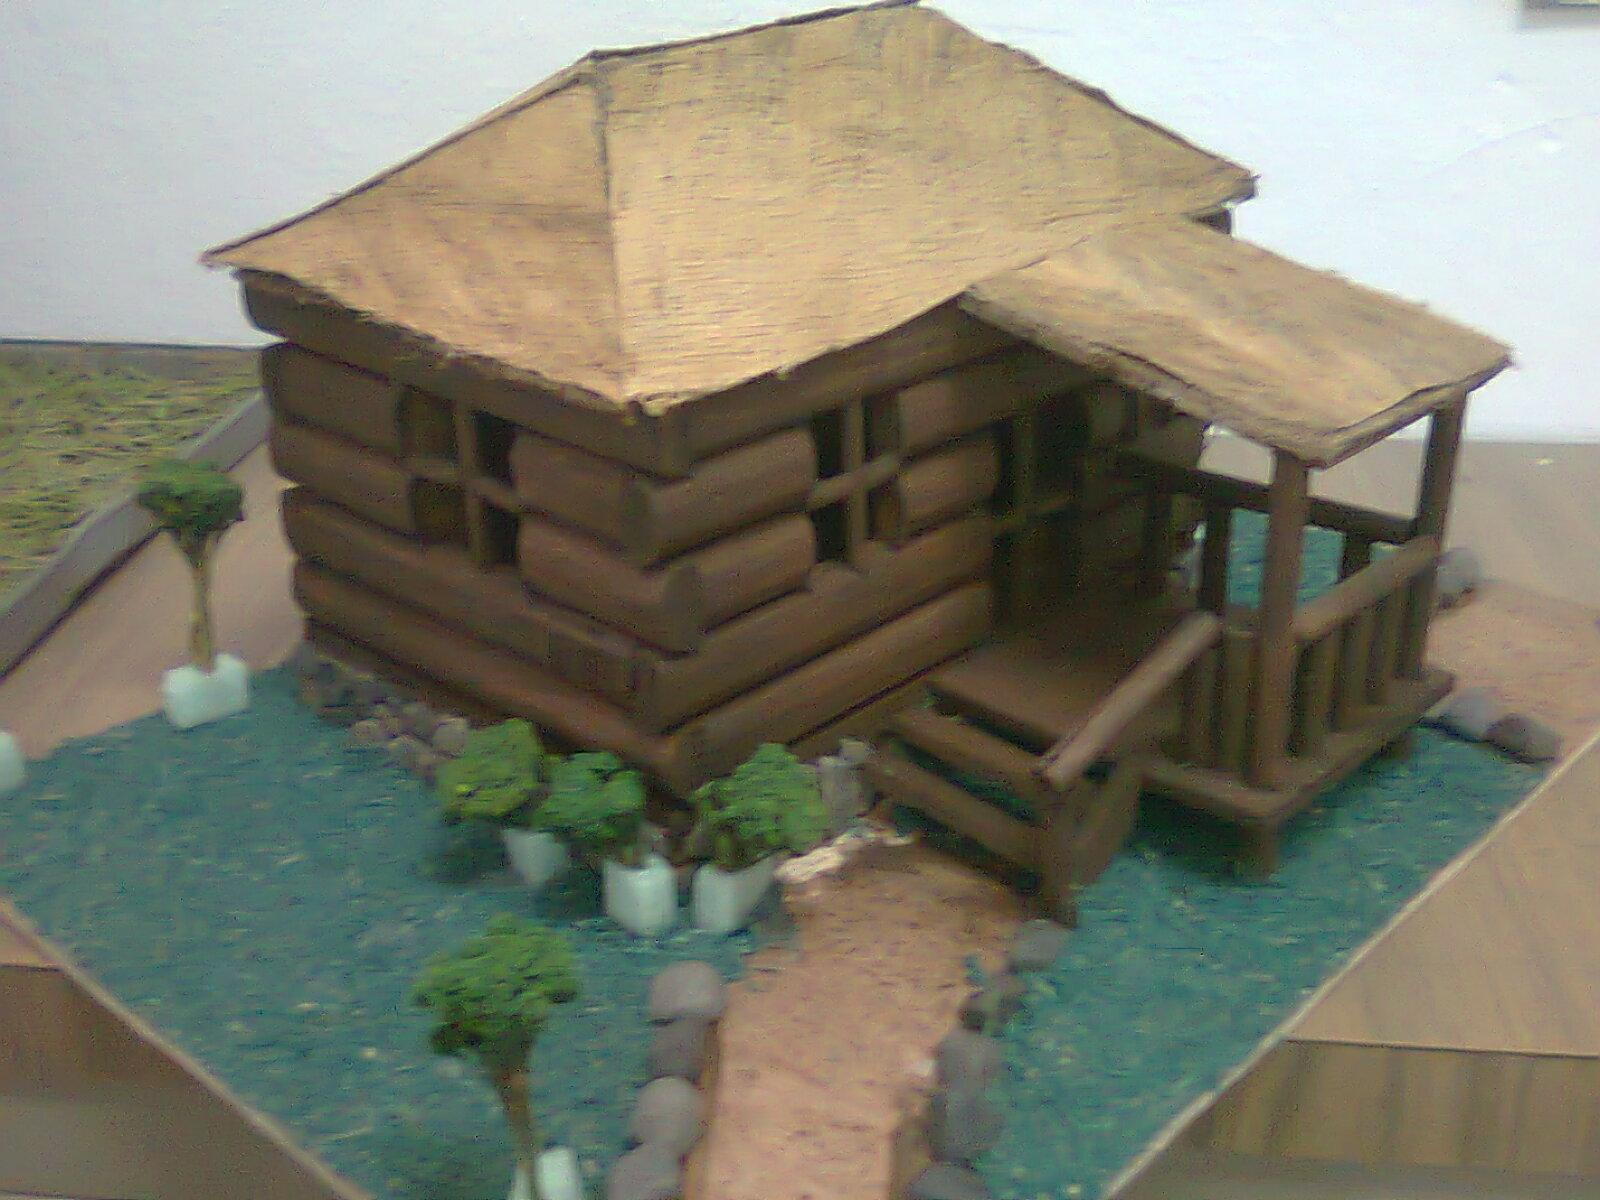 Arodi a uicab marin trabajos realizados en maquetas for Tipos de casas para construir